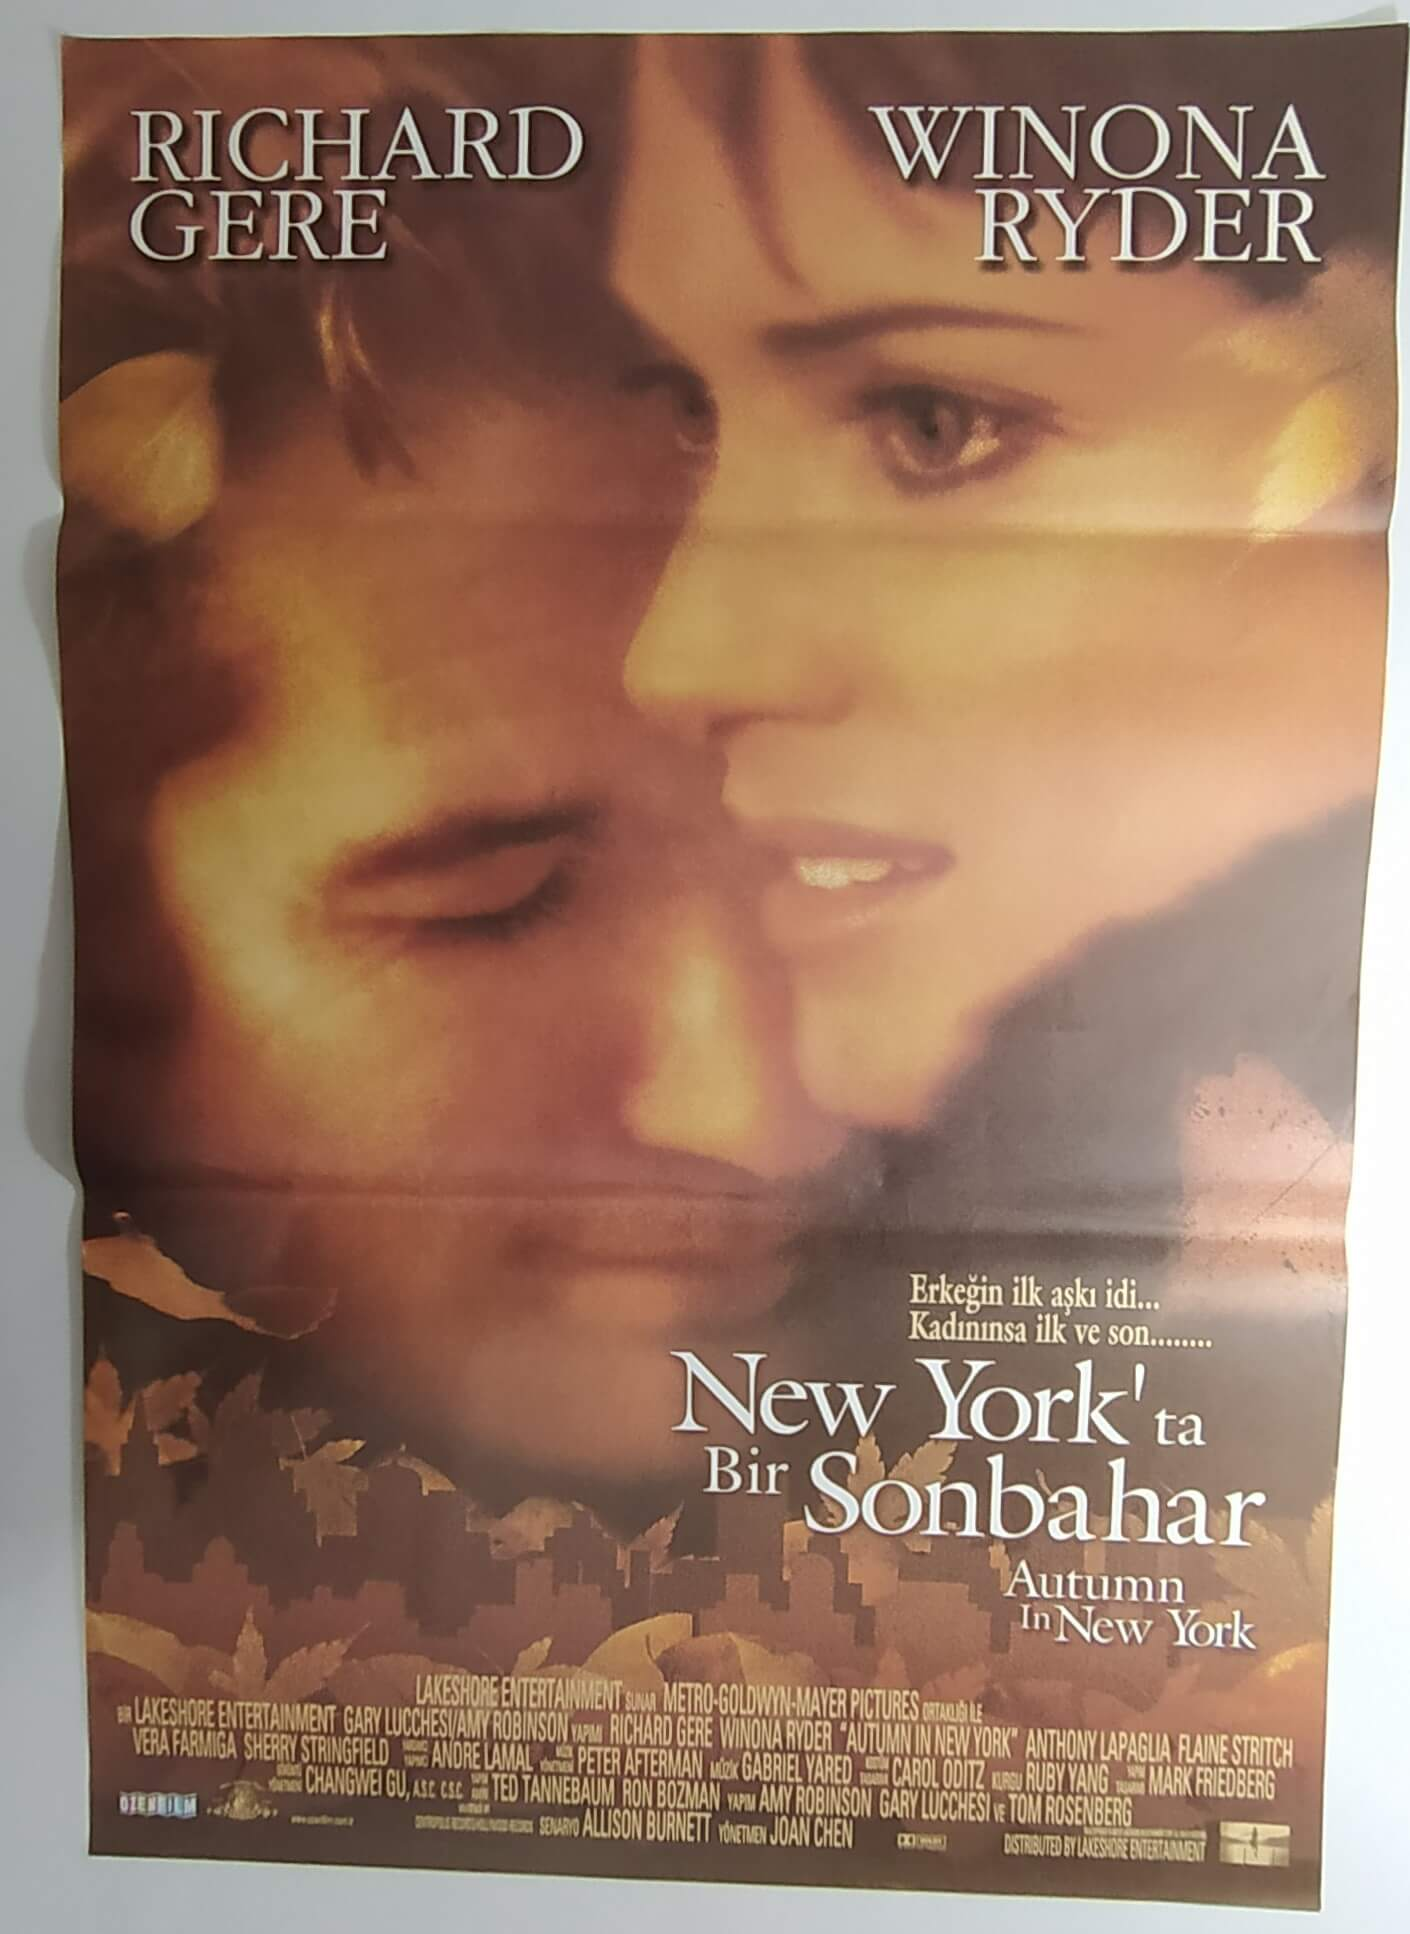 AUTUMN IN NEW YORK movie poster